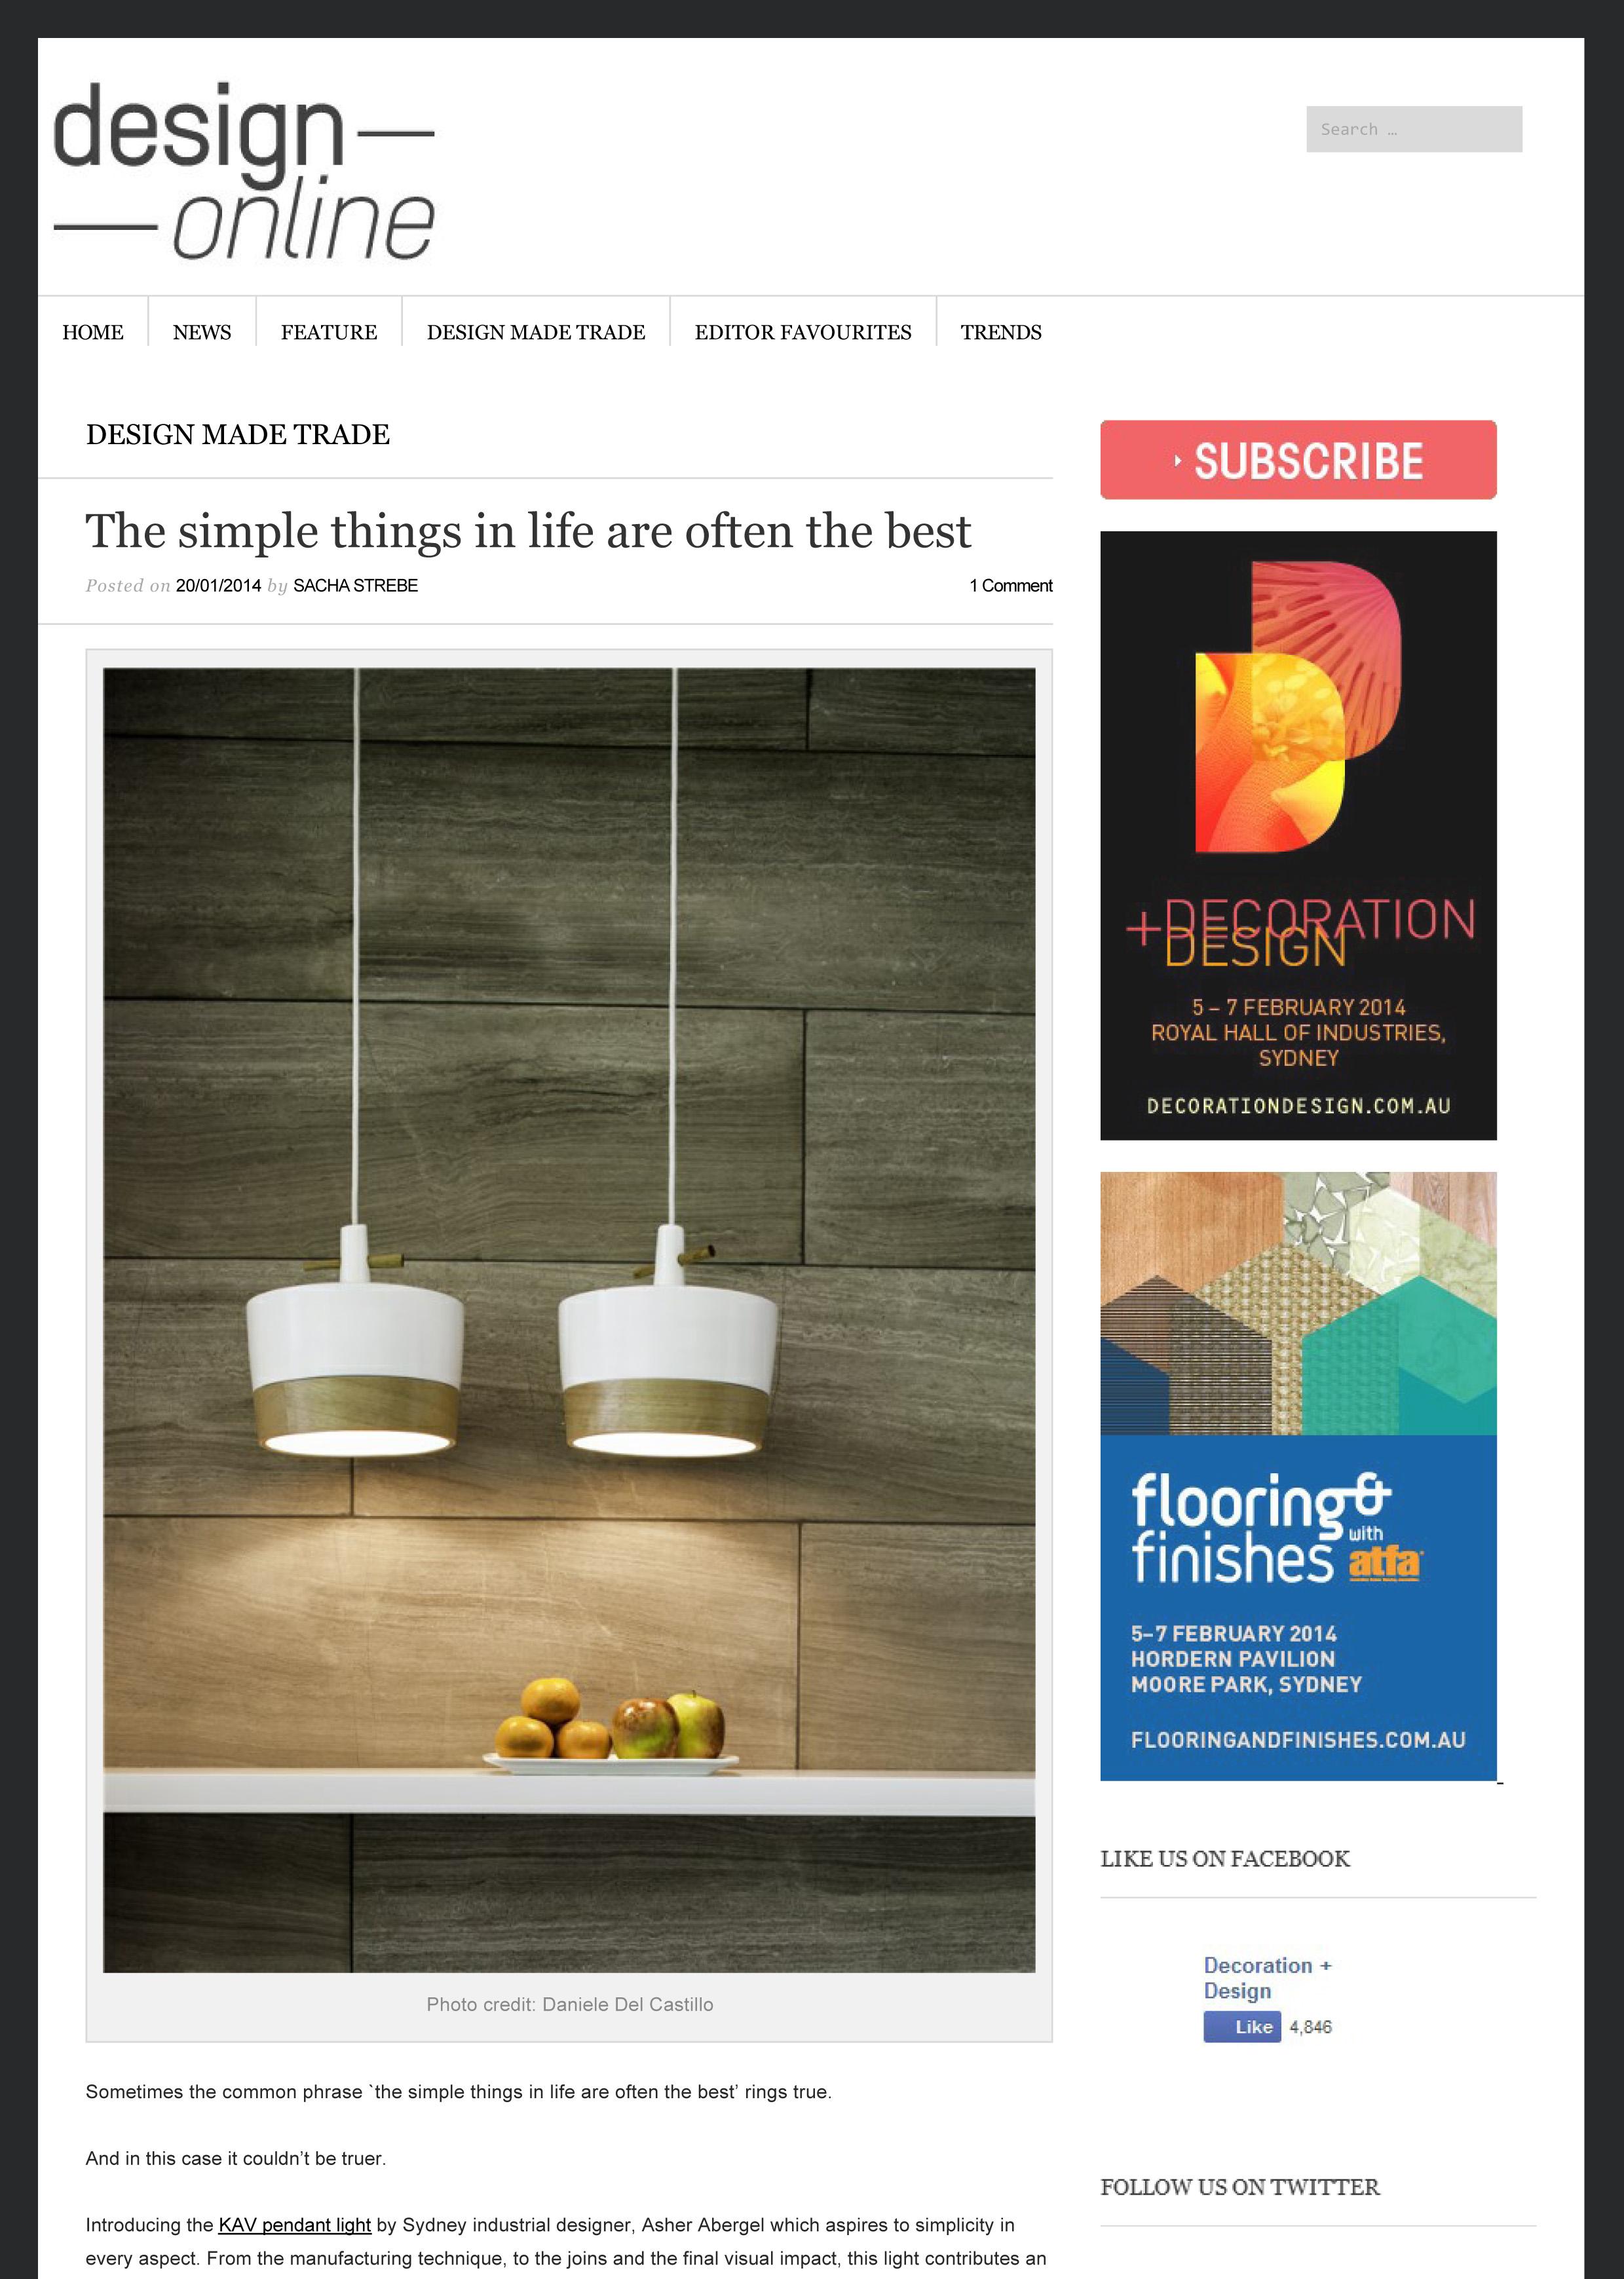 Design Online, January 2014